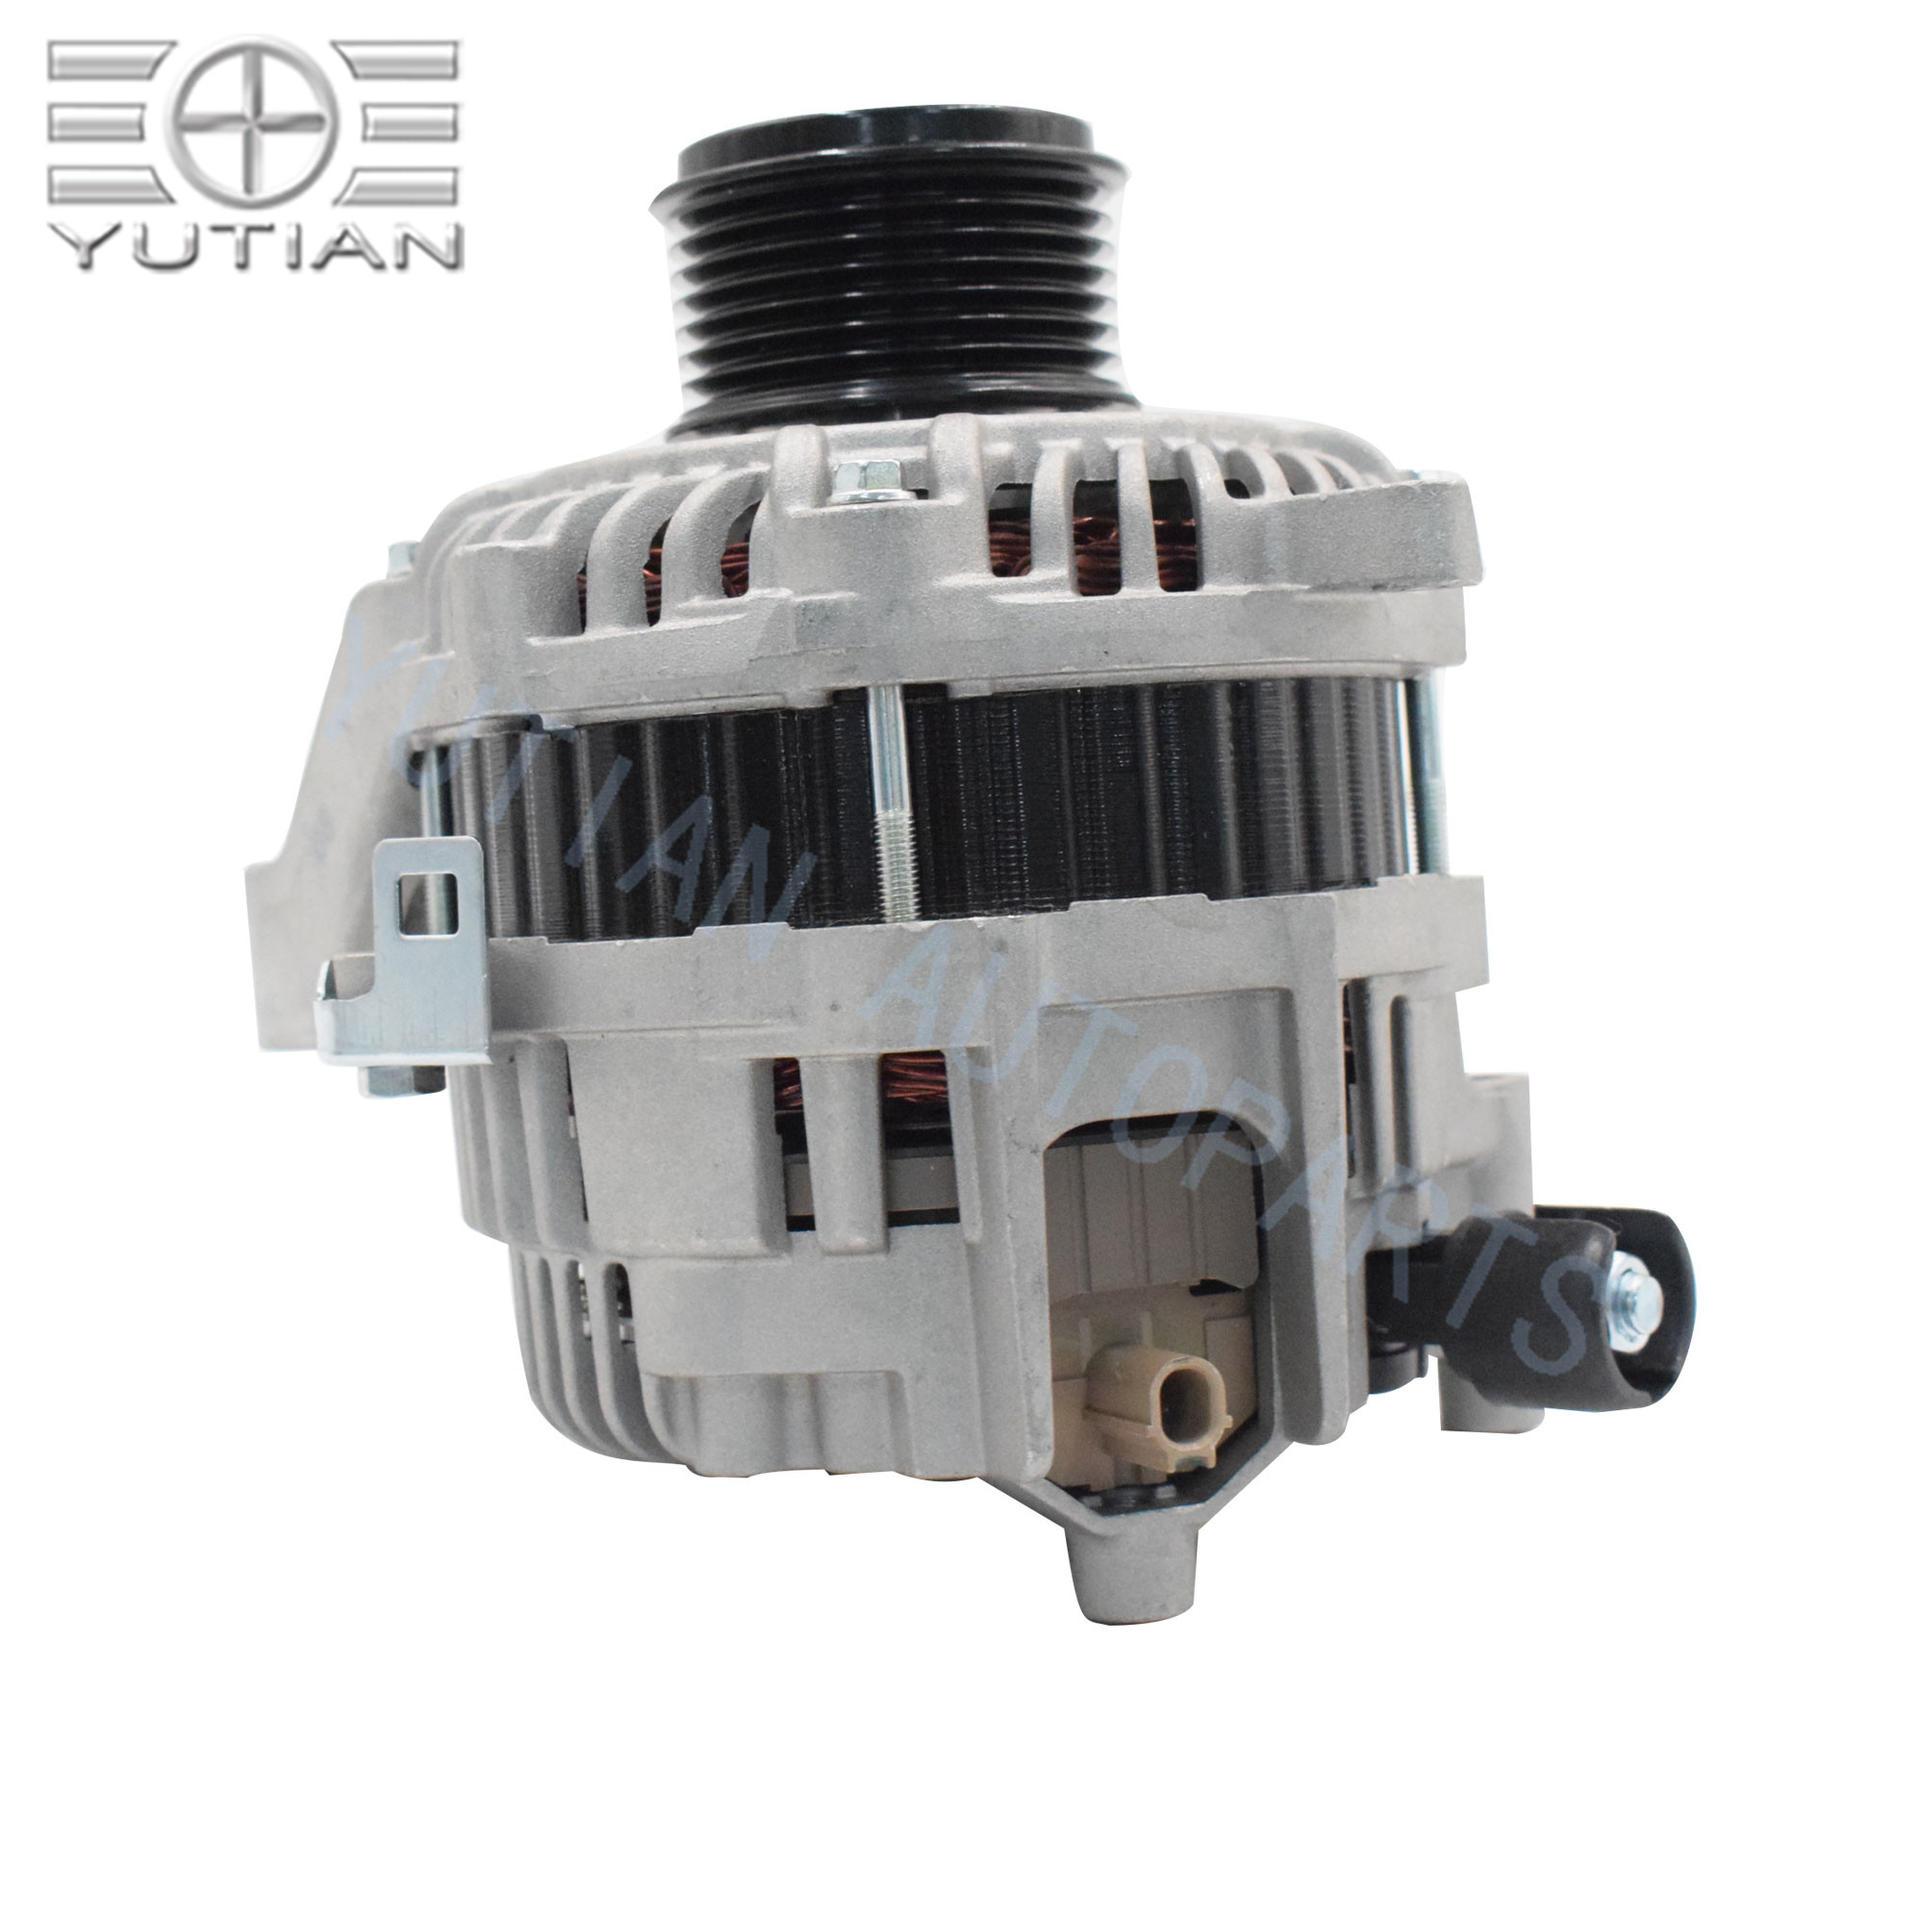 For Honda Alternator Accord 2014 2.4L Car generator OEM 31100-5A2-A02